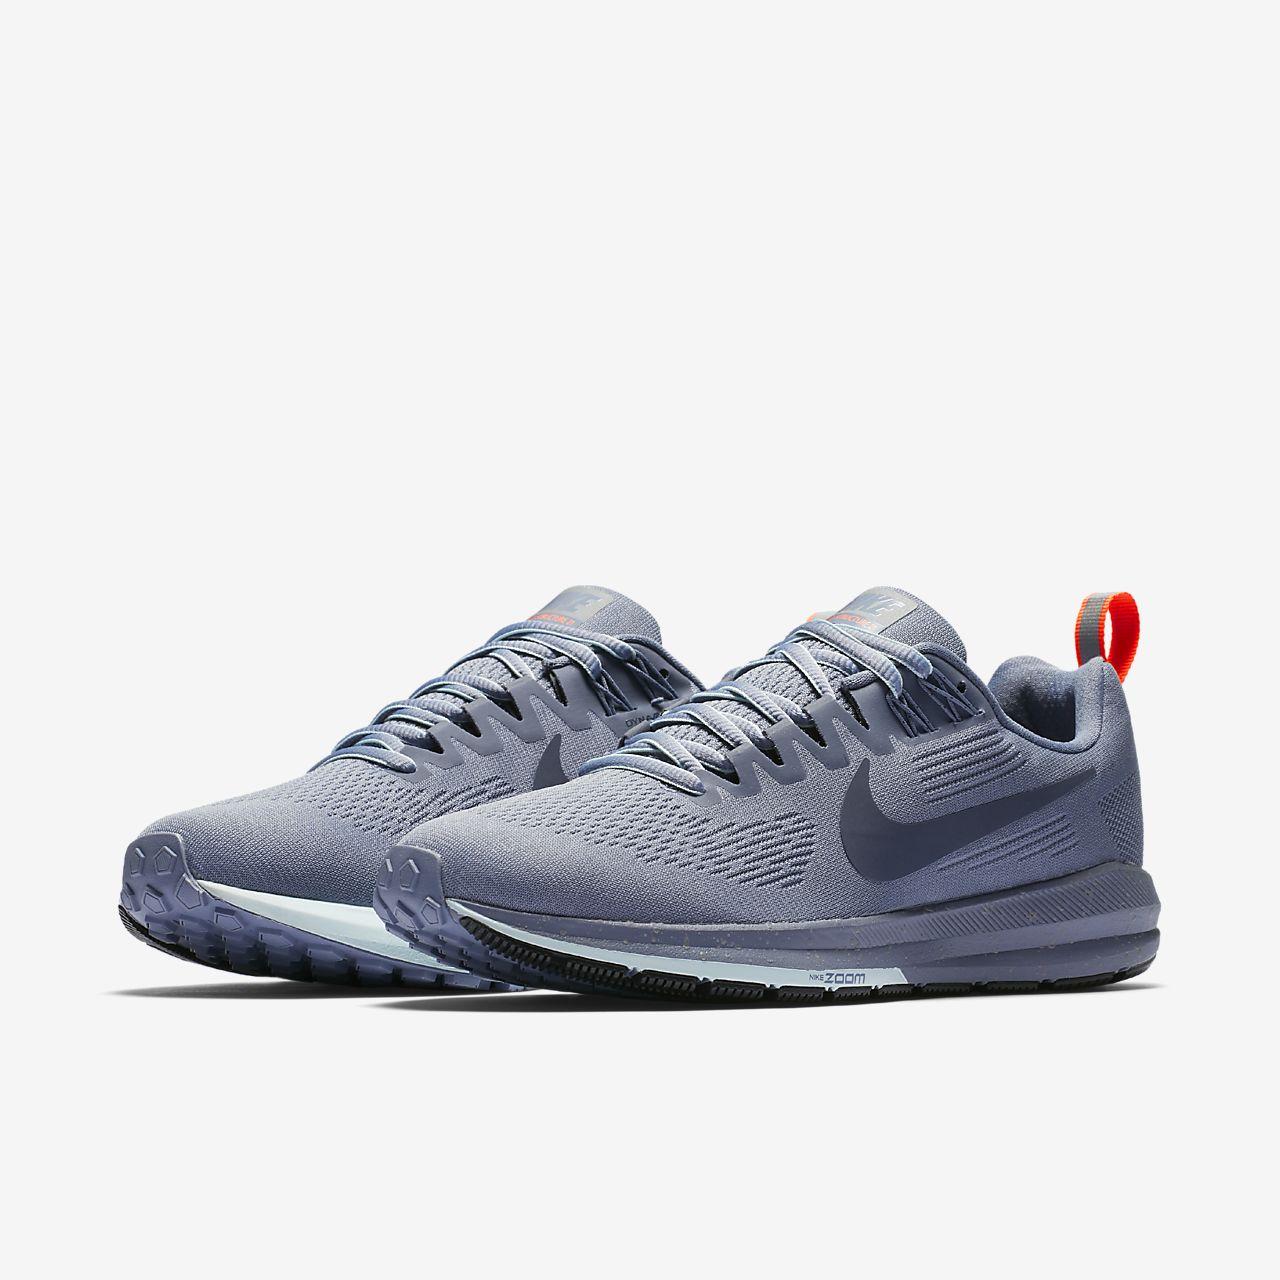 ... Nike Air Zoom Structure 21 Shield Zapatillas de running - Mujer